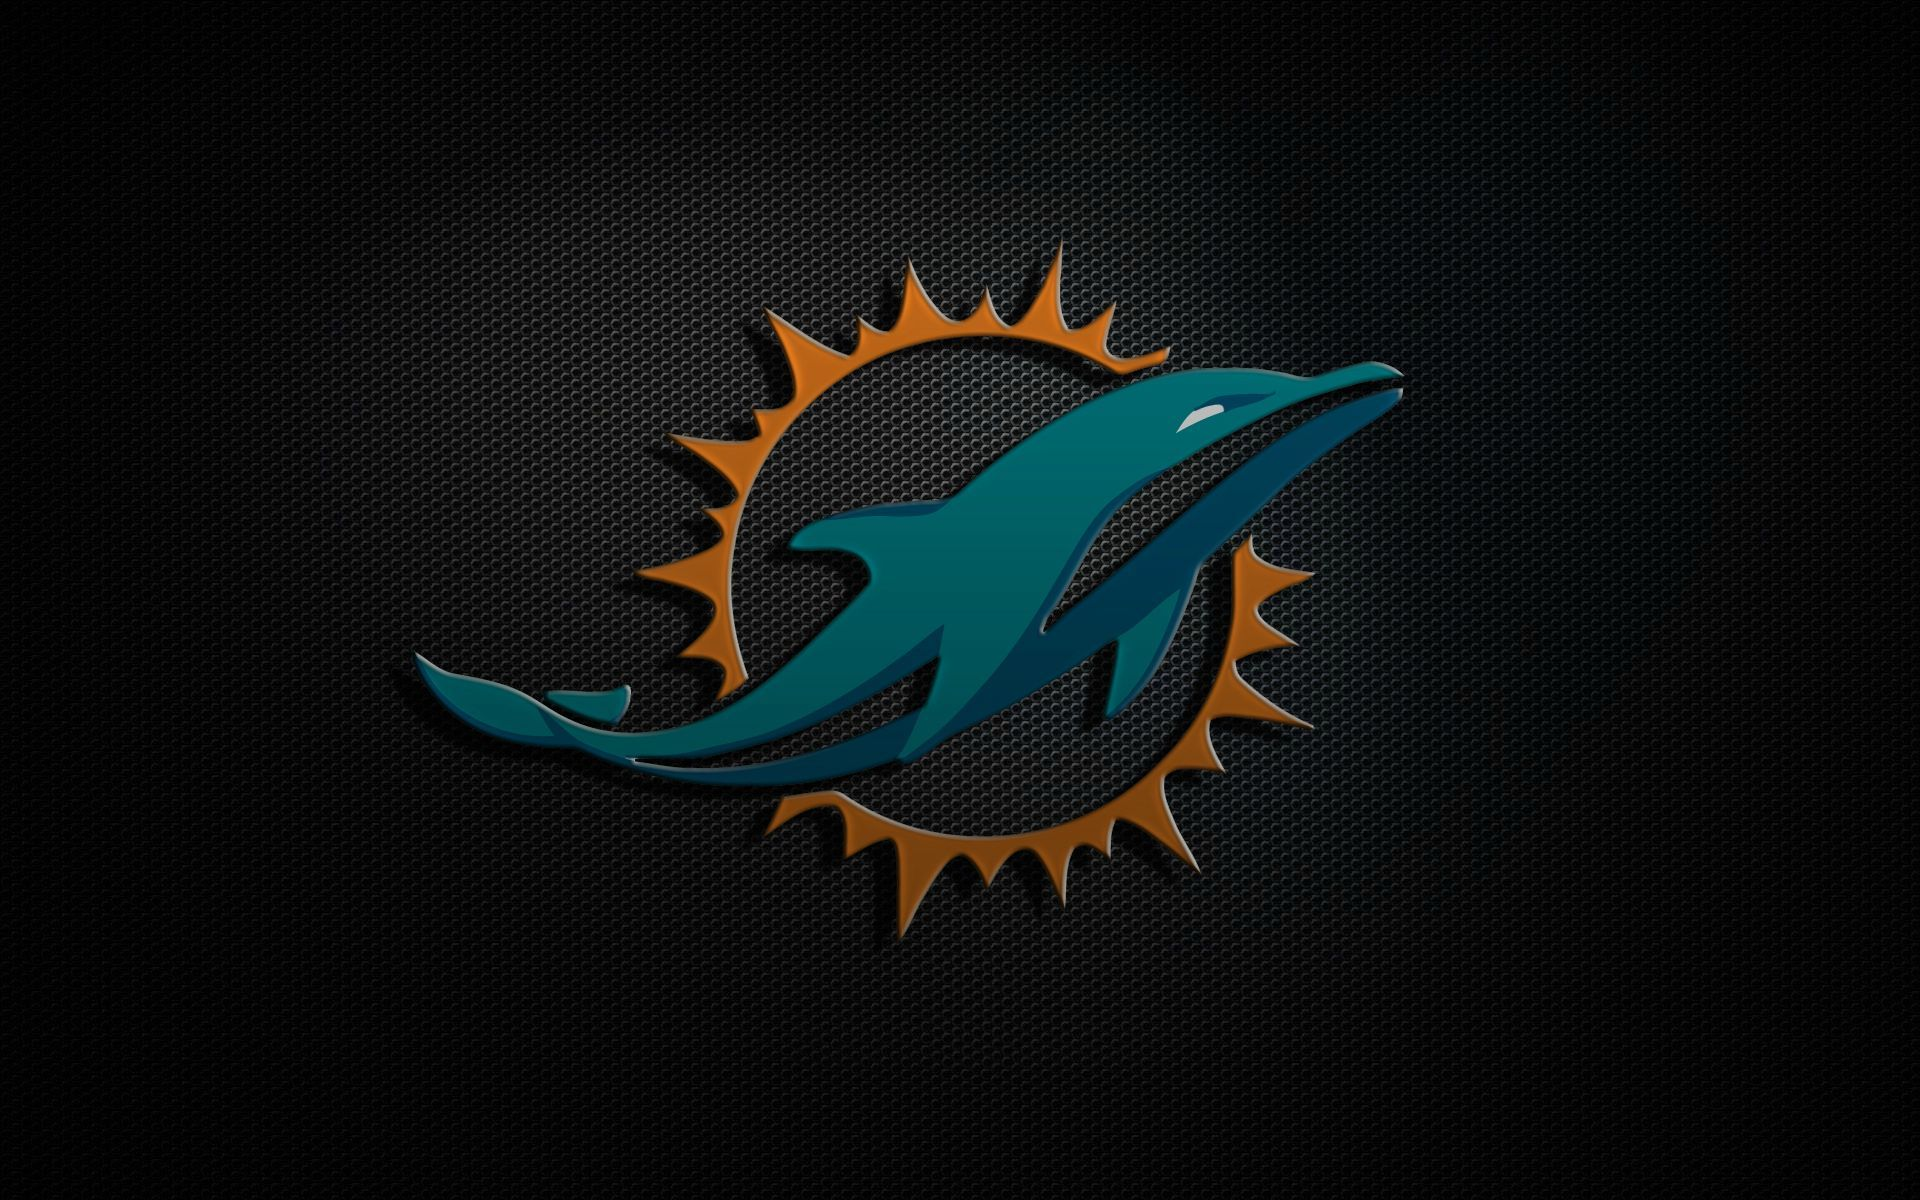 miami dolphins wallpaper Google Search MIAMI DOLPHINS